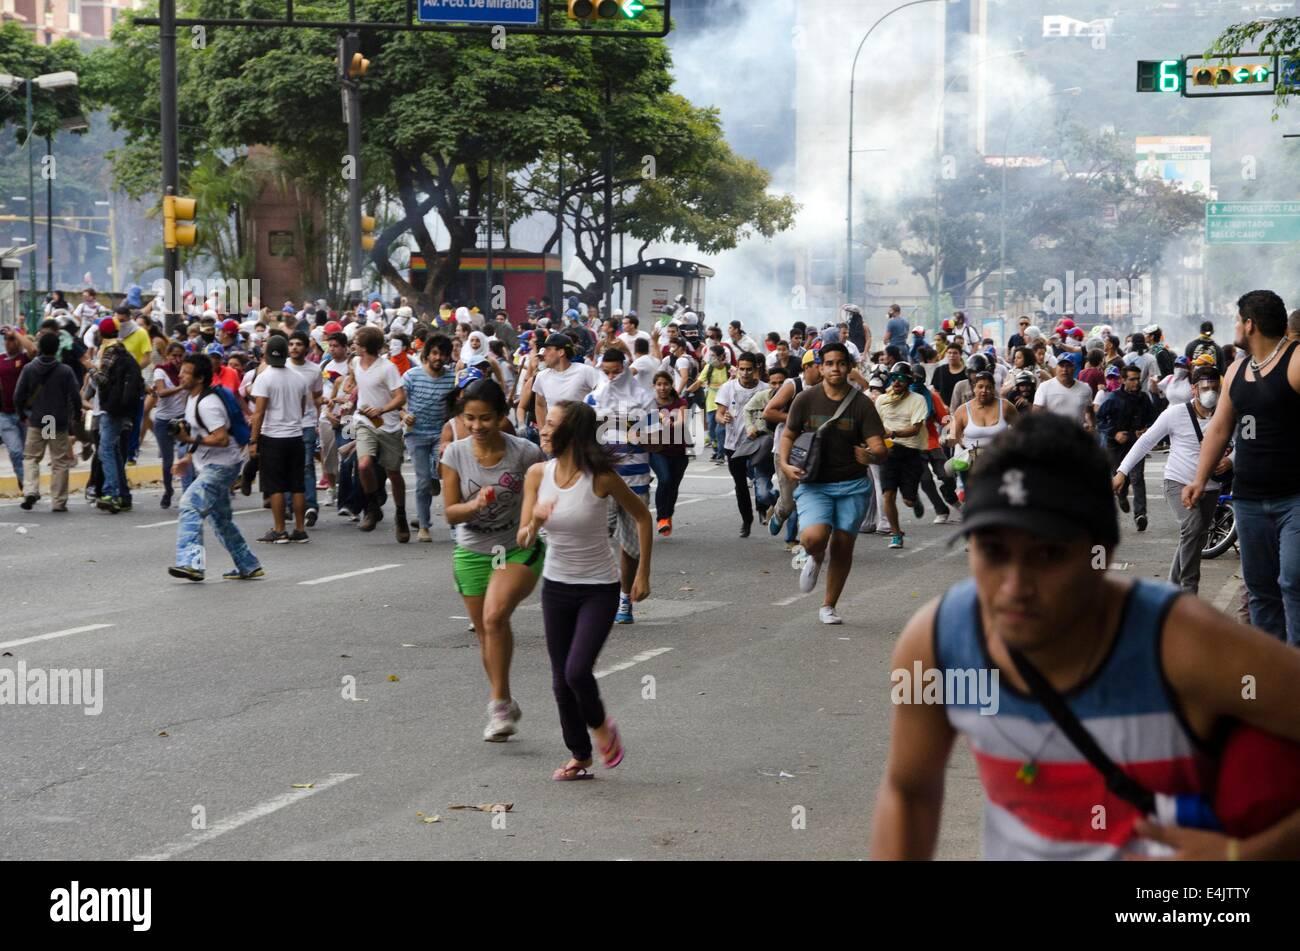 Venezuelans protest en masse in rival rallies. Altamira square. Caracas, Venezuela. - Stock Image